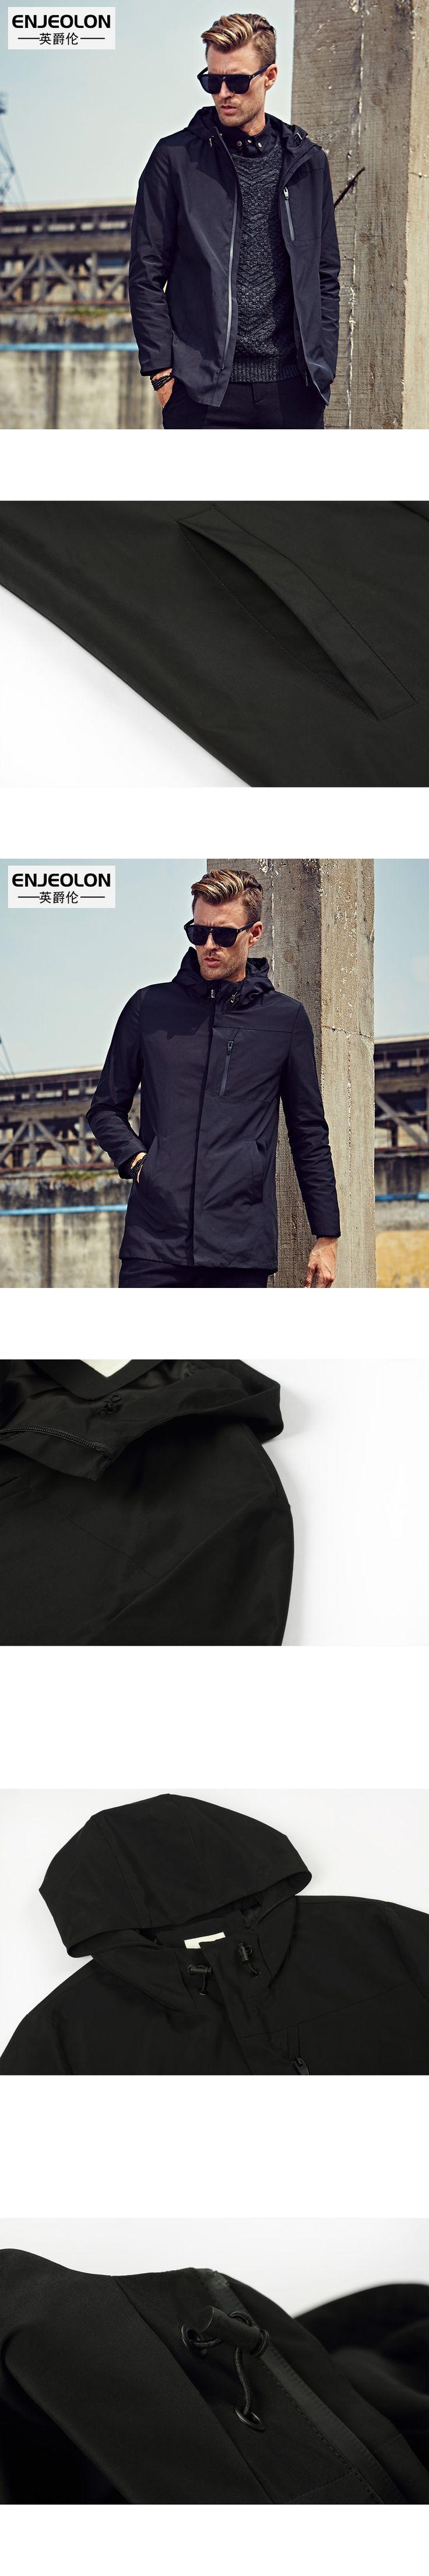 Enjeolon brand 2017 hooded Bomber windbreaker jackets men, fashion black solid Mens coats,hoodies Jacket Men cool clothes JK0319